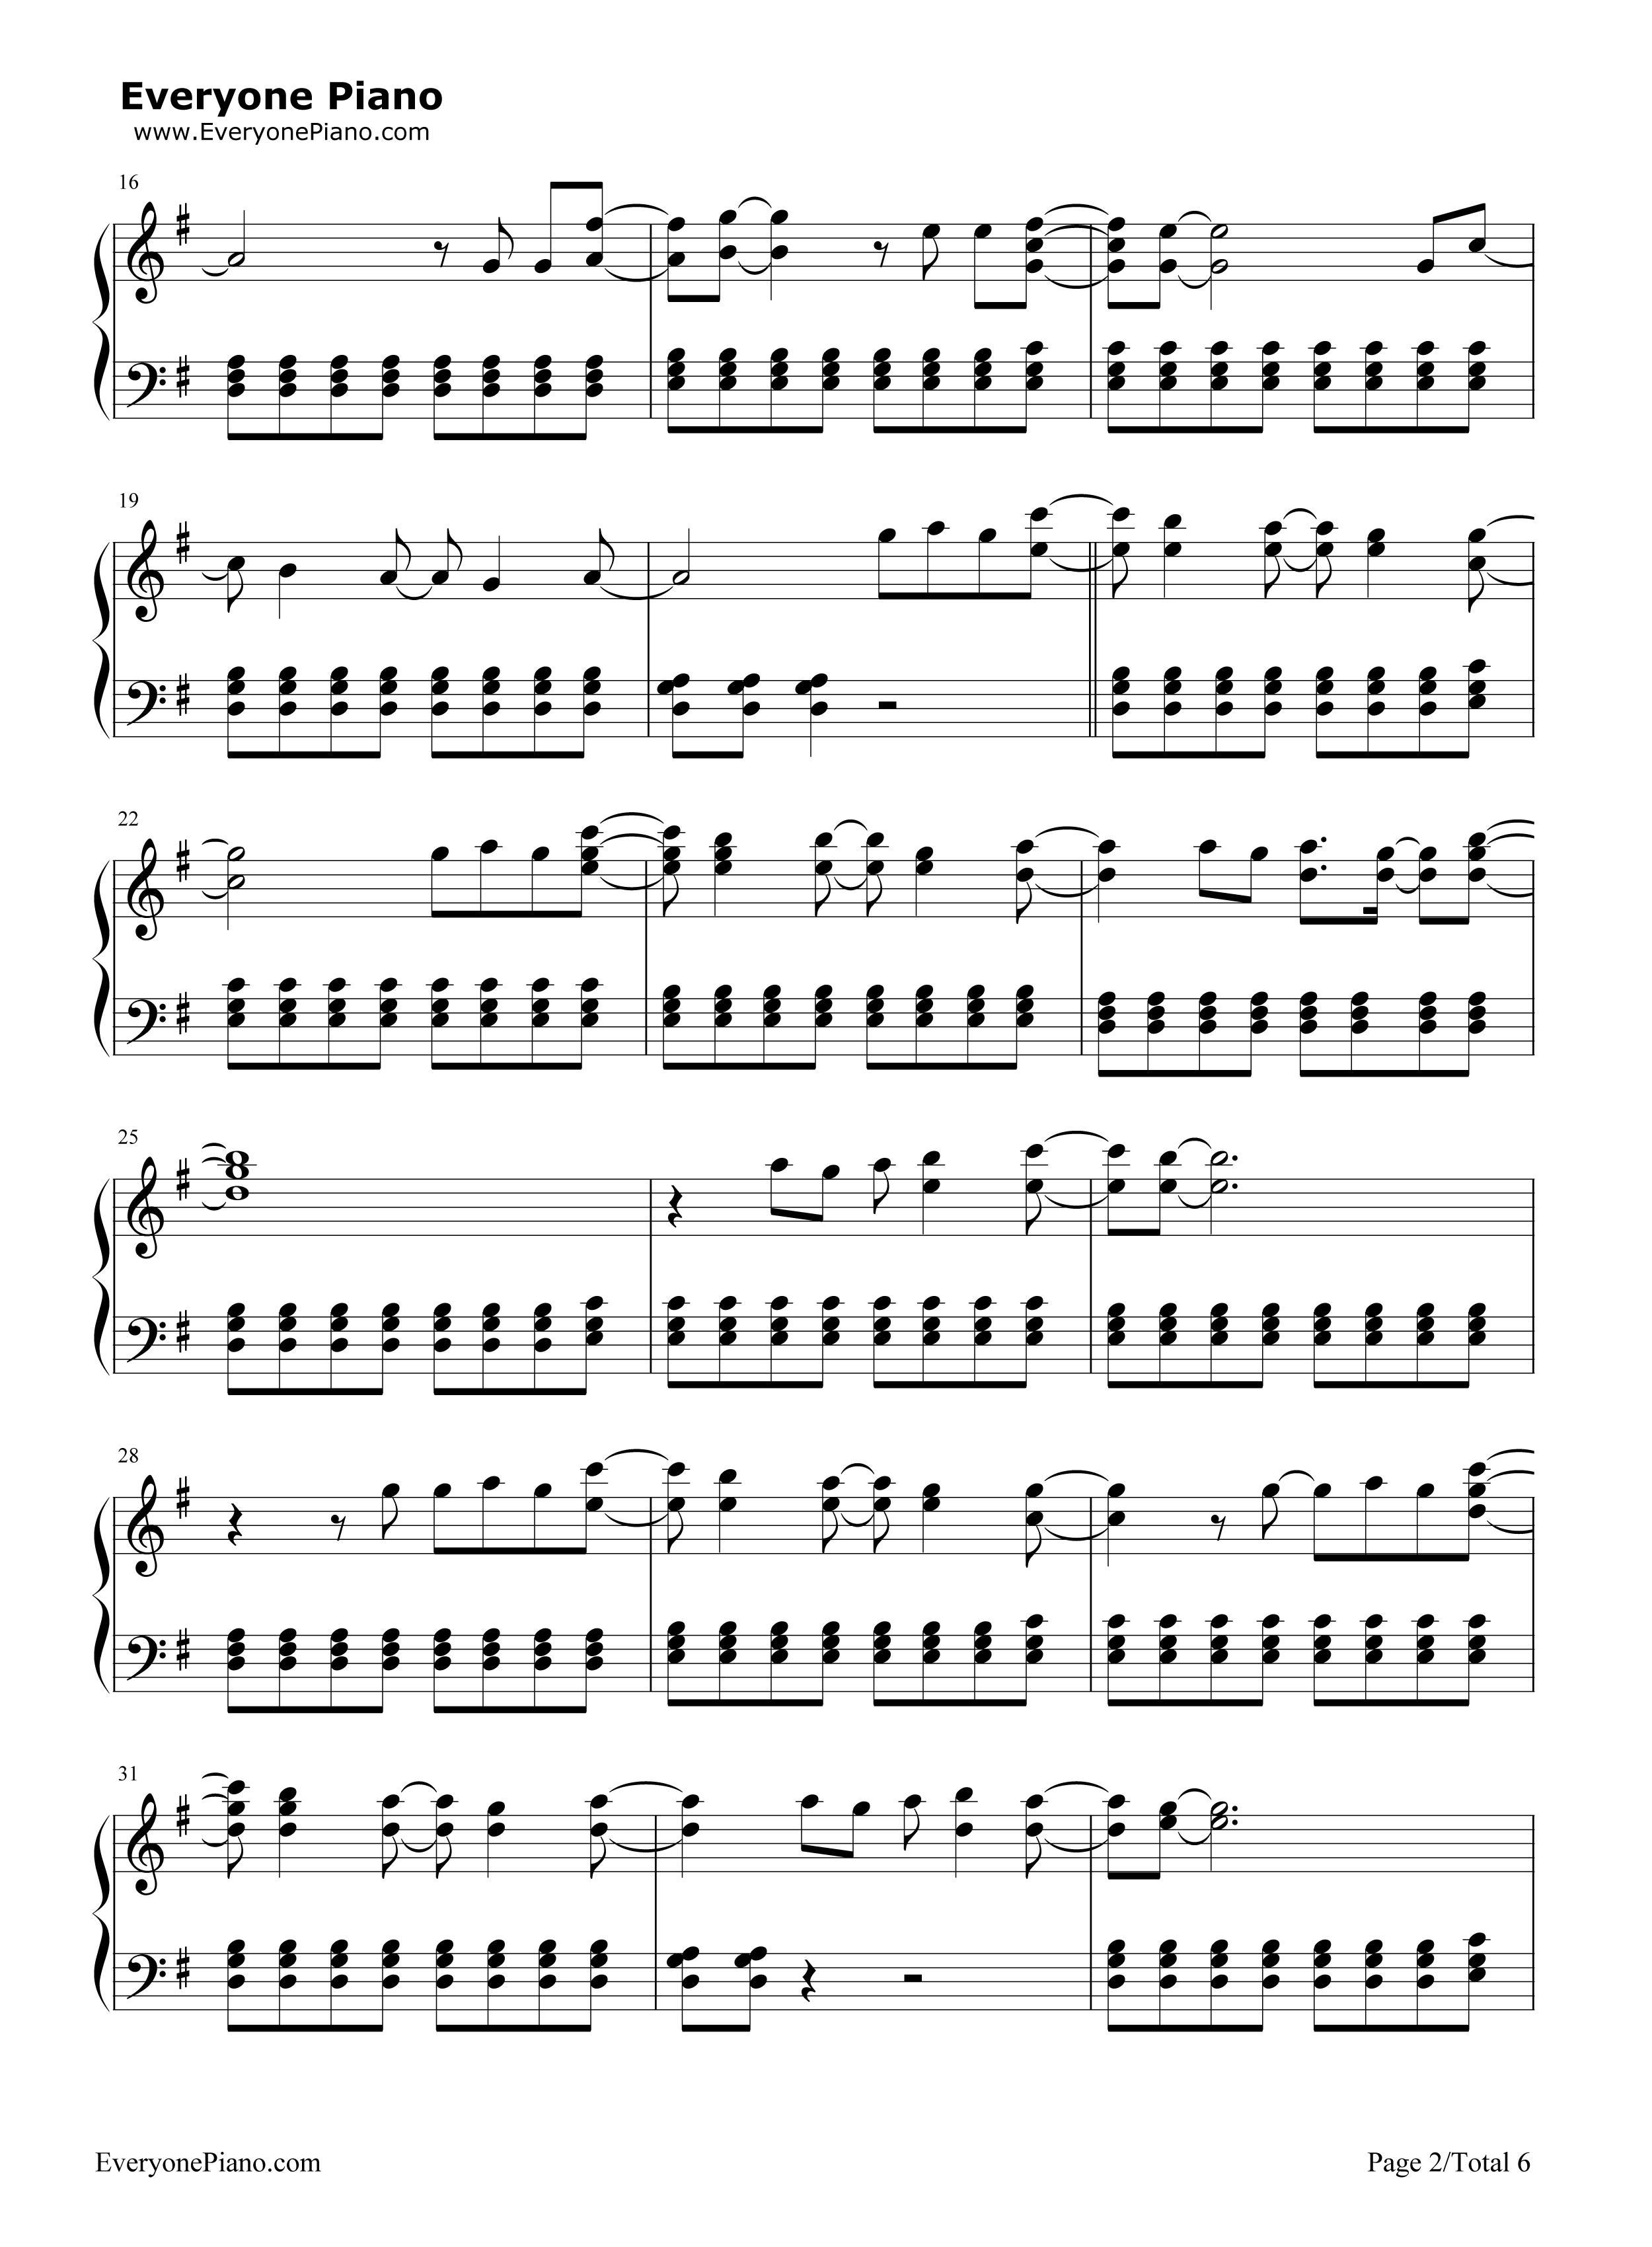 Fancy Skyscraper Chords Elaboration Beginner Guitar Piano Chords